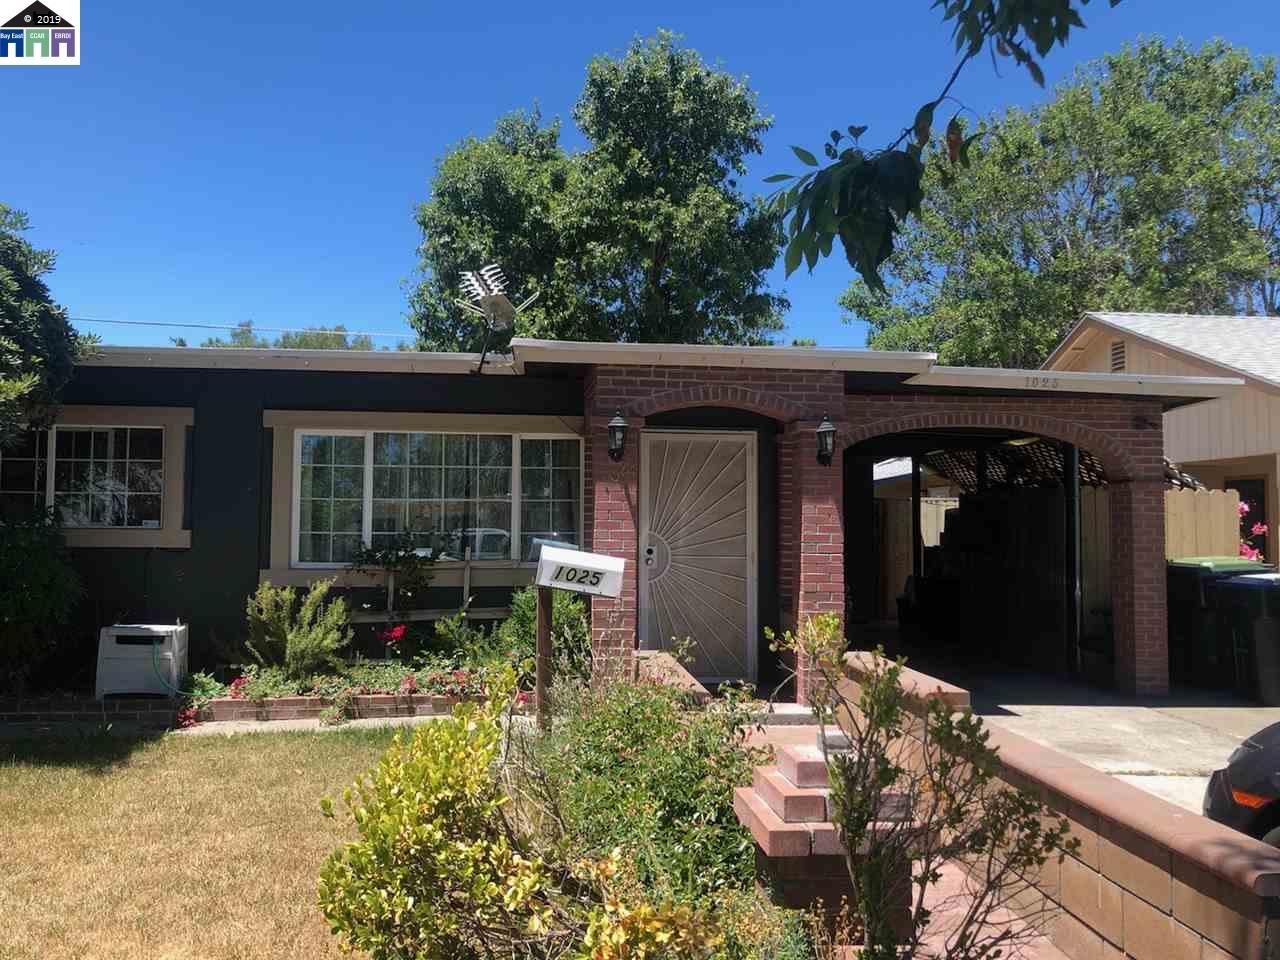 1025 Hayes St Fairfield, CA 94533